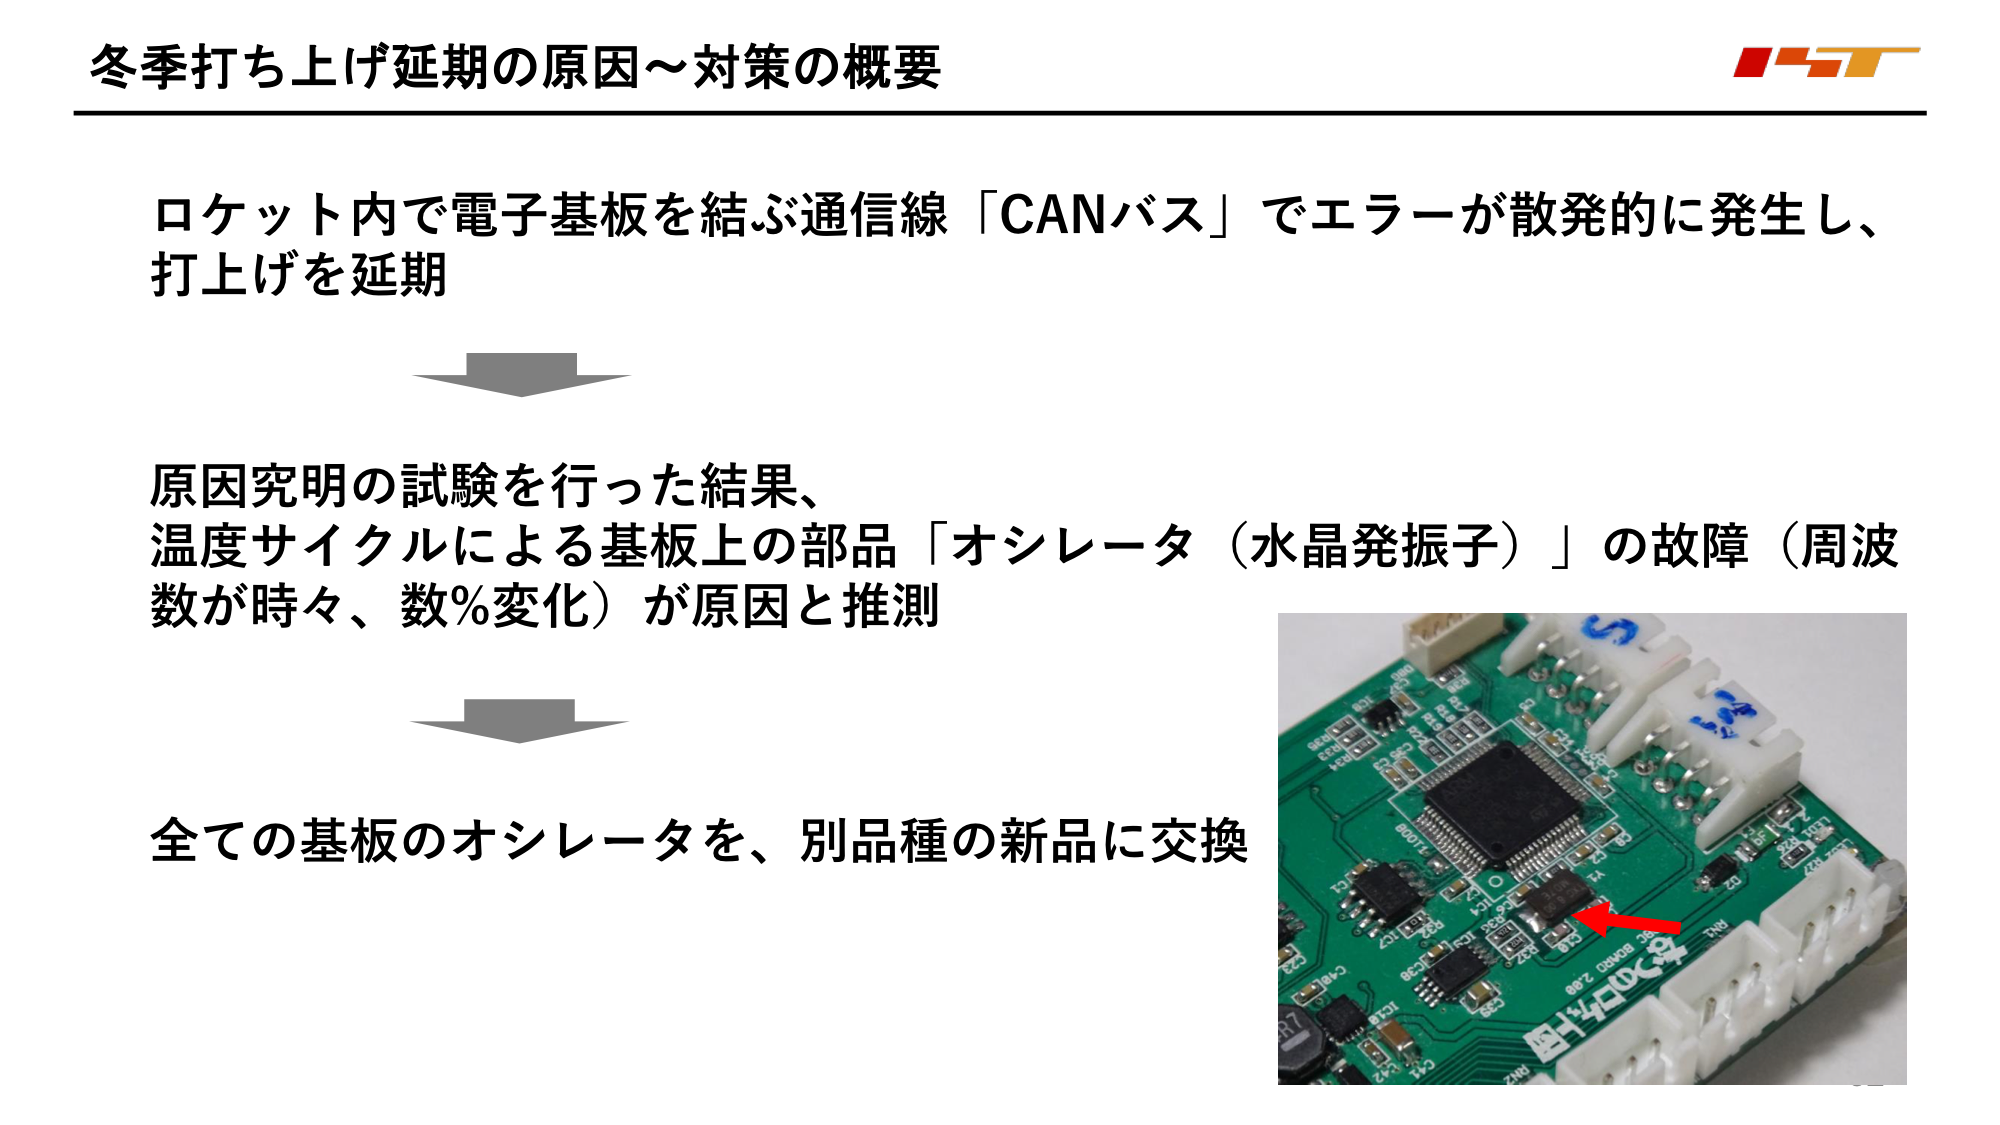 f:id:Imamura:20200603233255p:plain